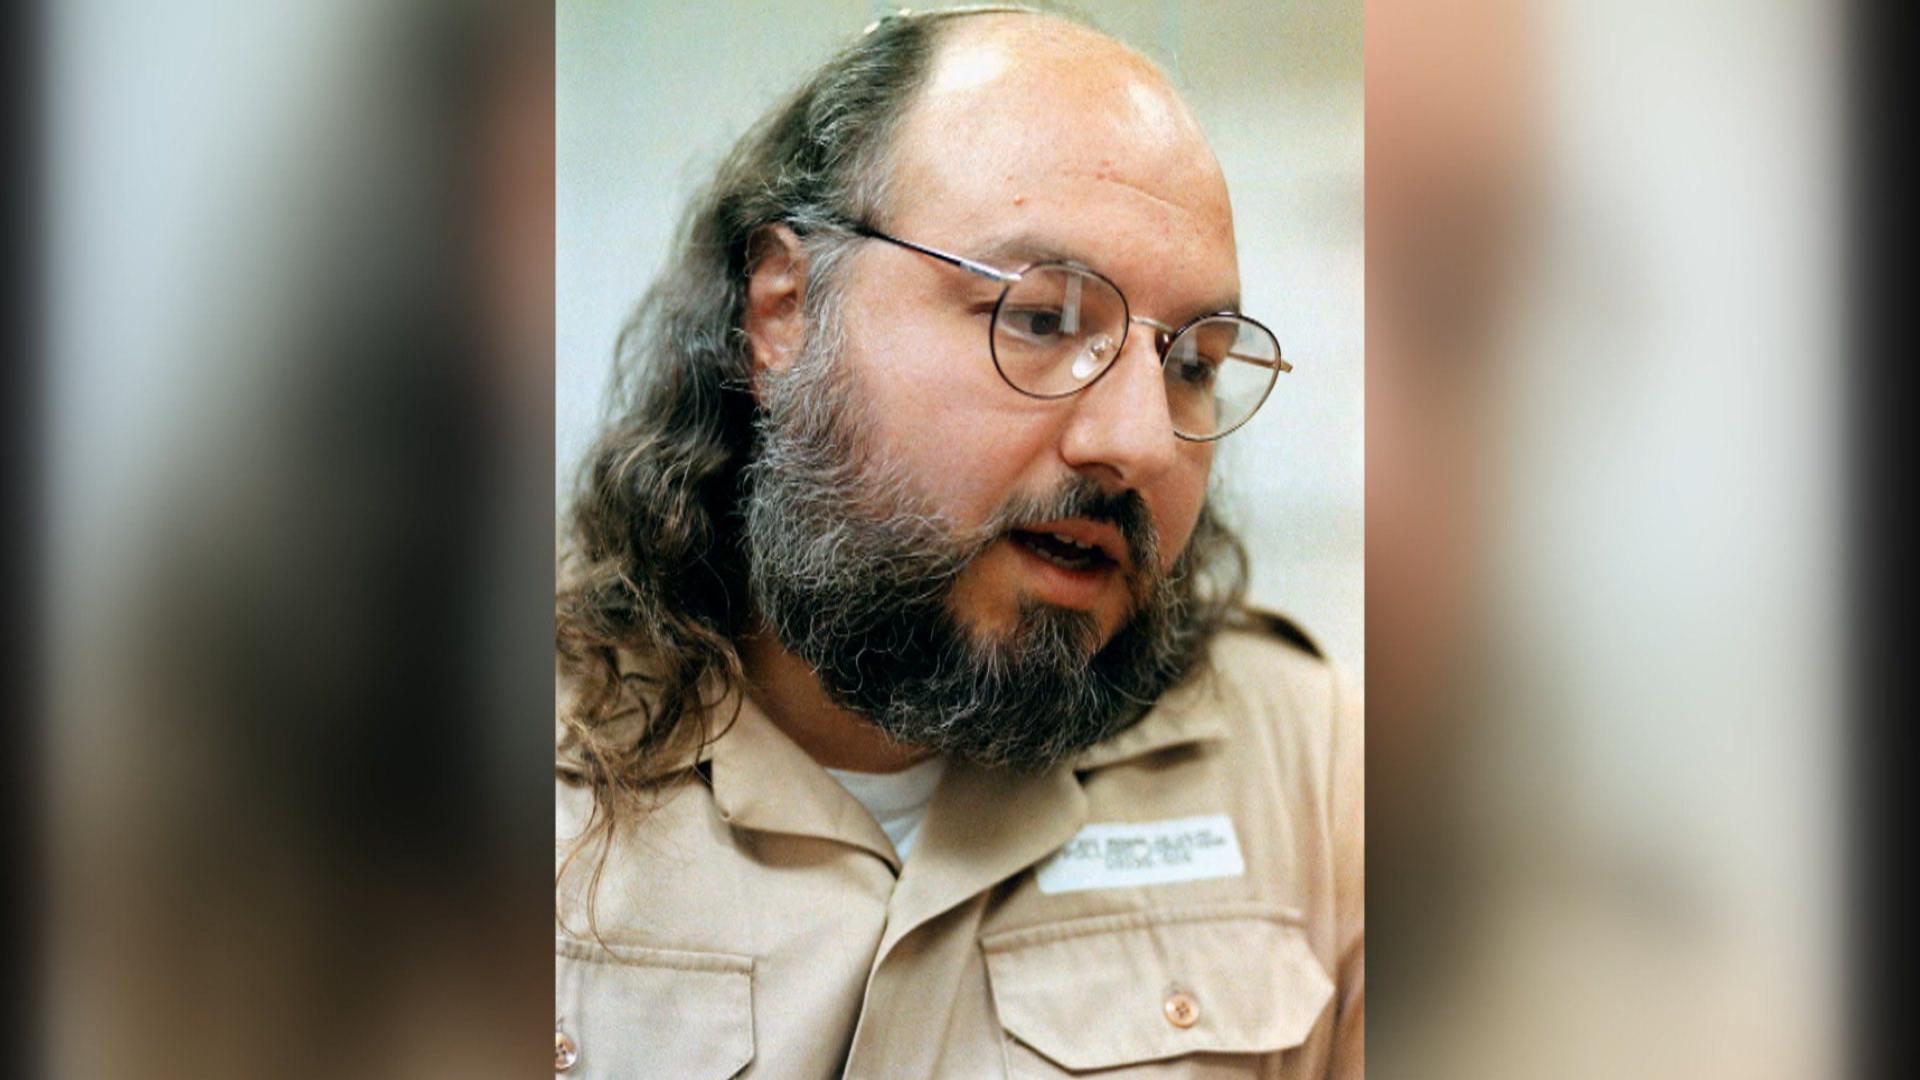 US considers parole for convicted Israeli spy